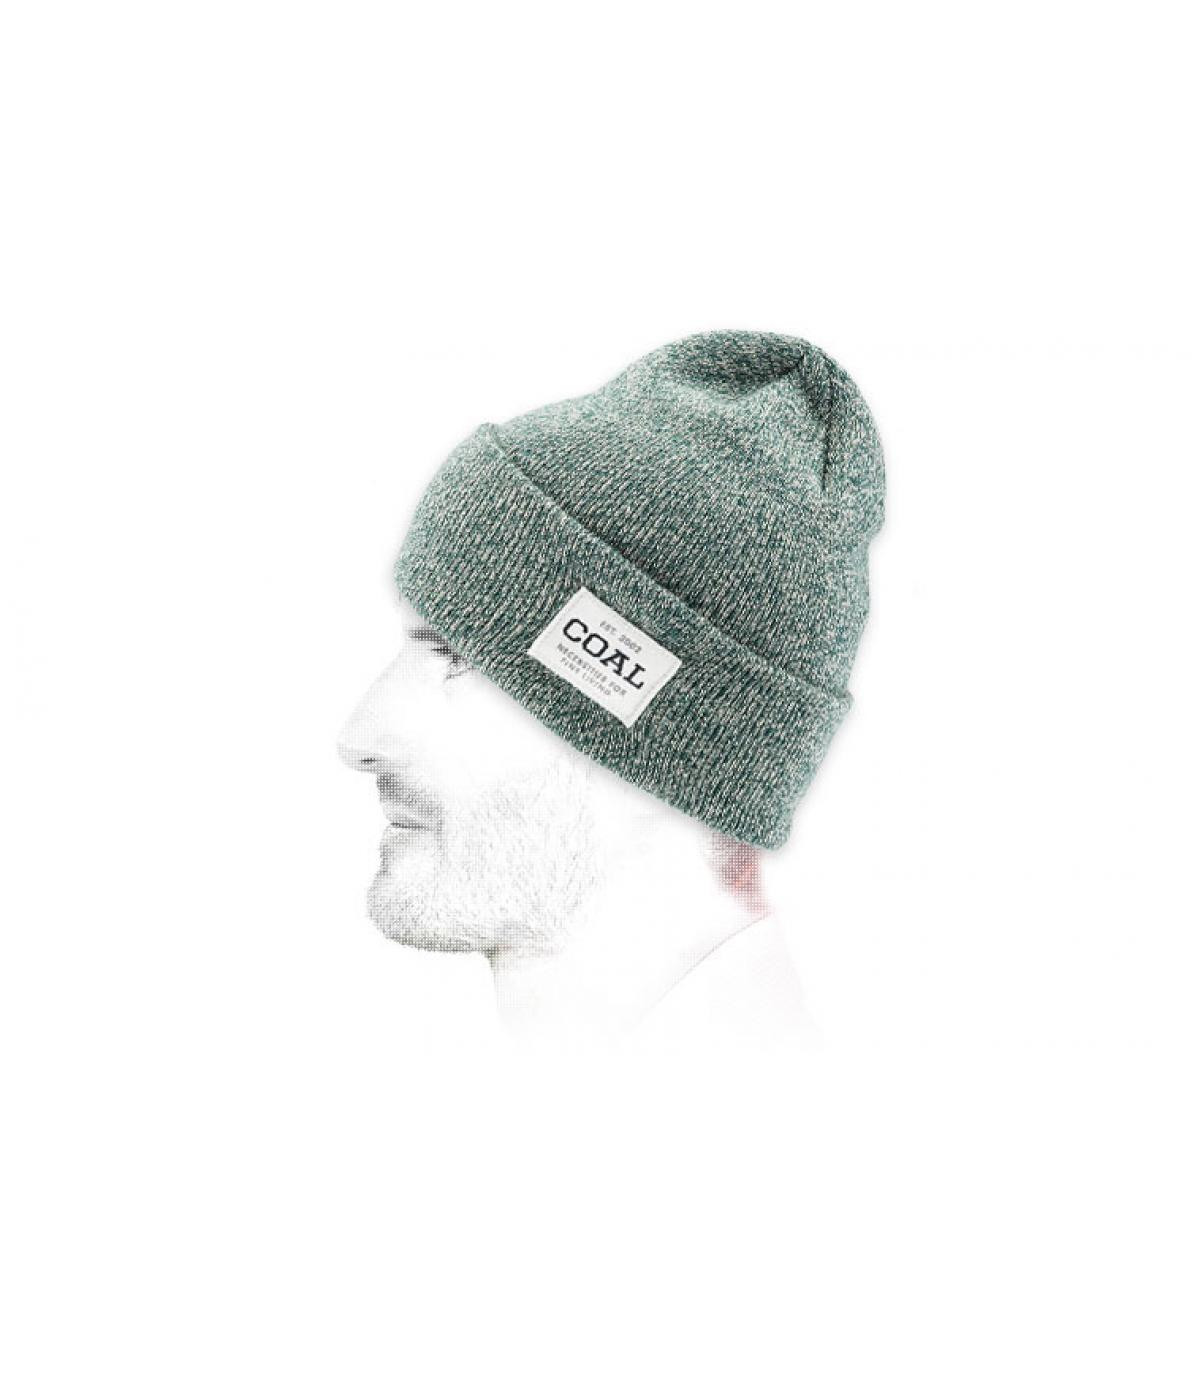 Grüne Mütze Revers Coal